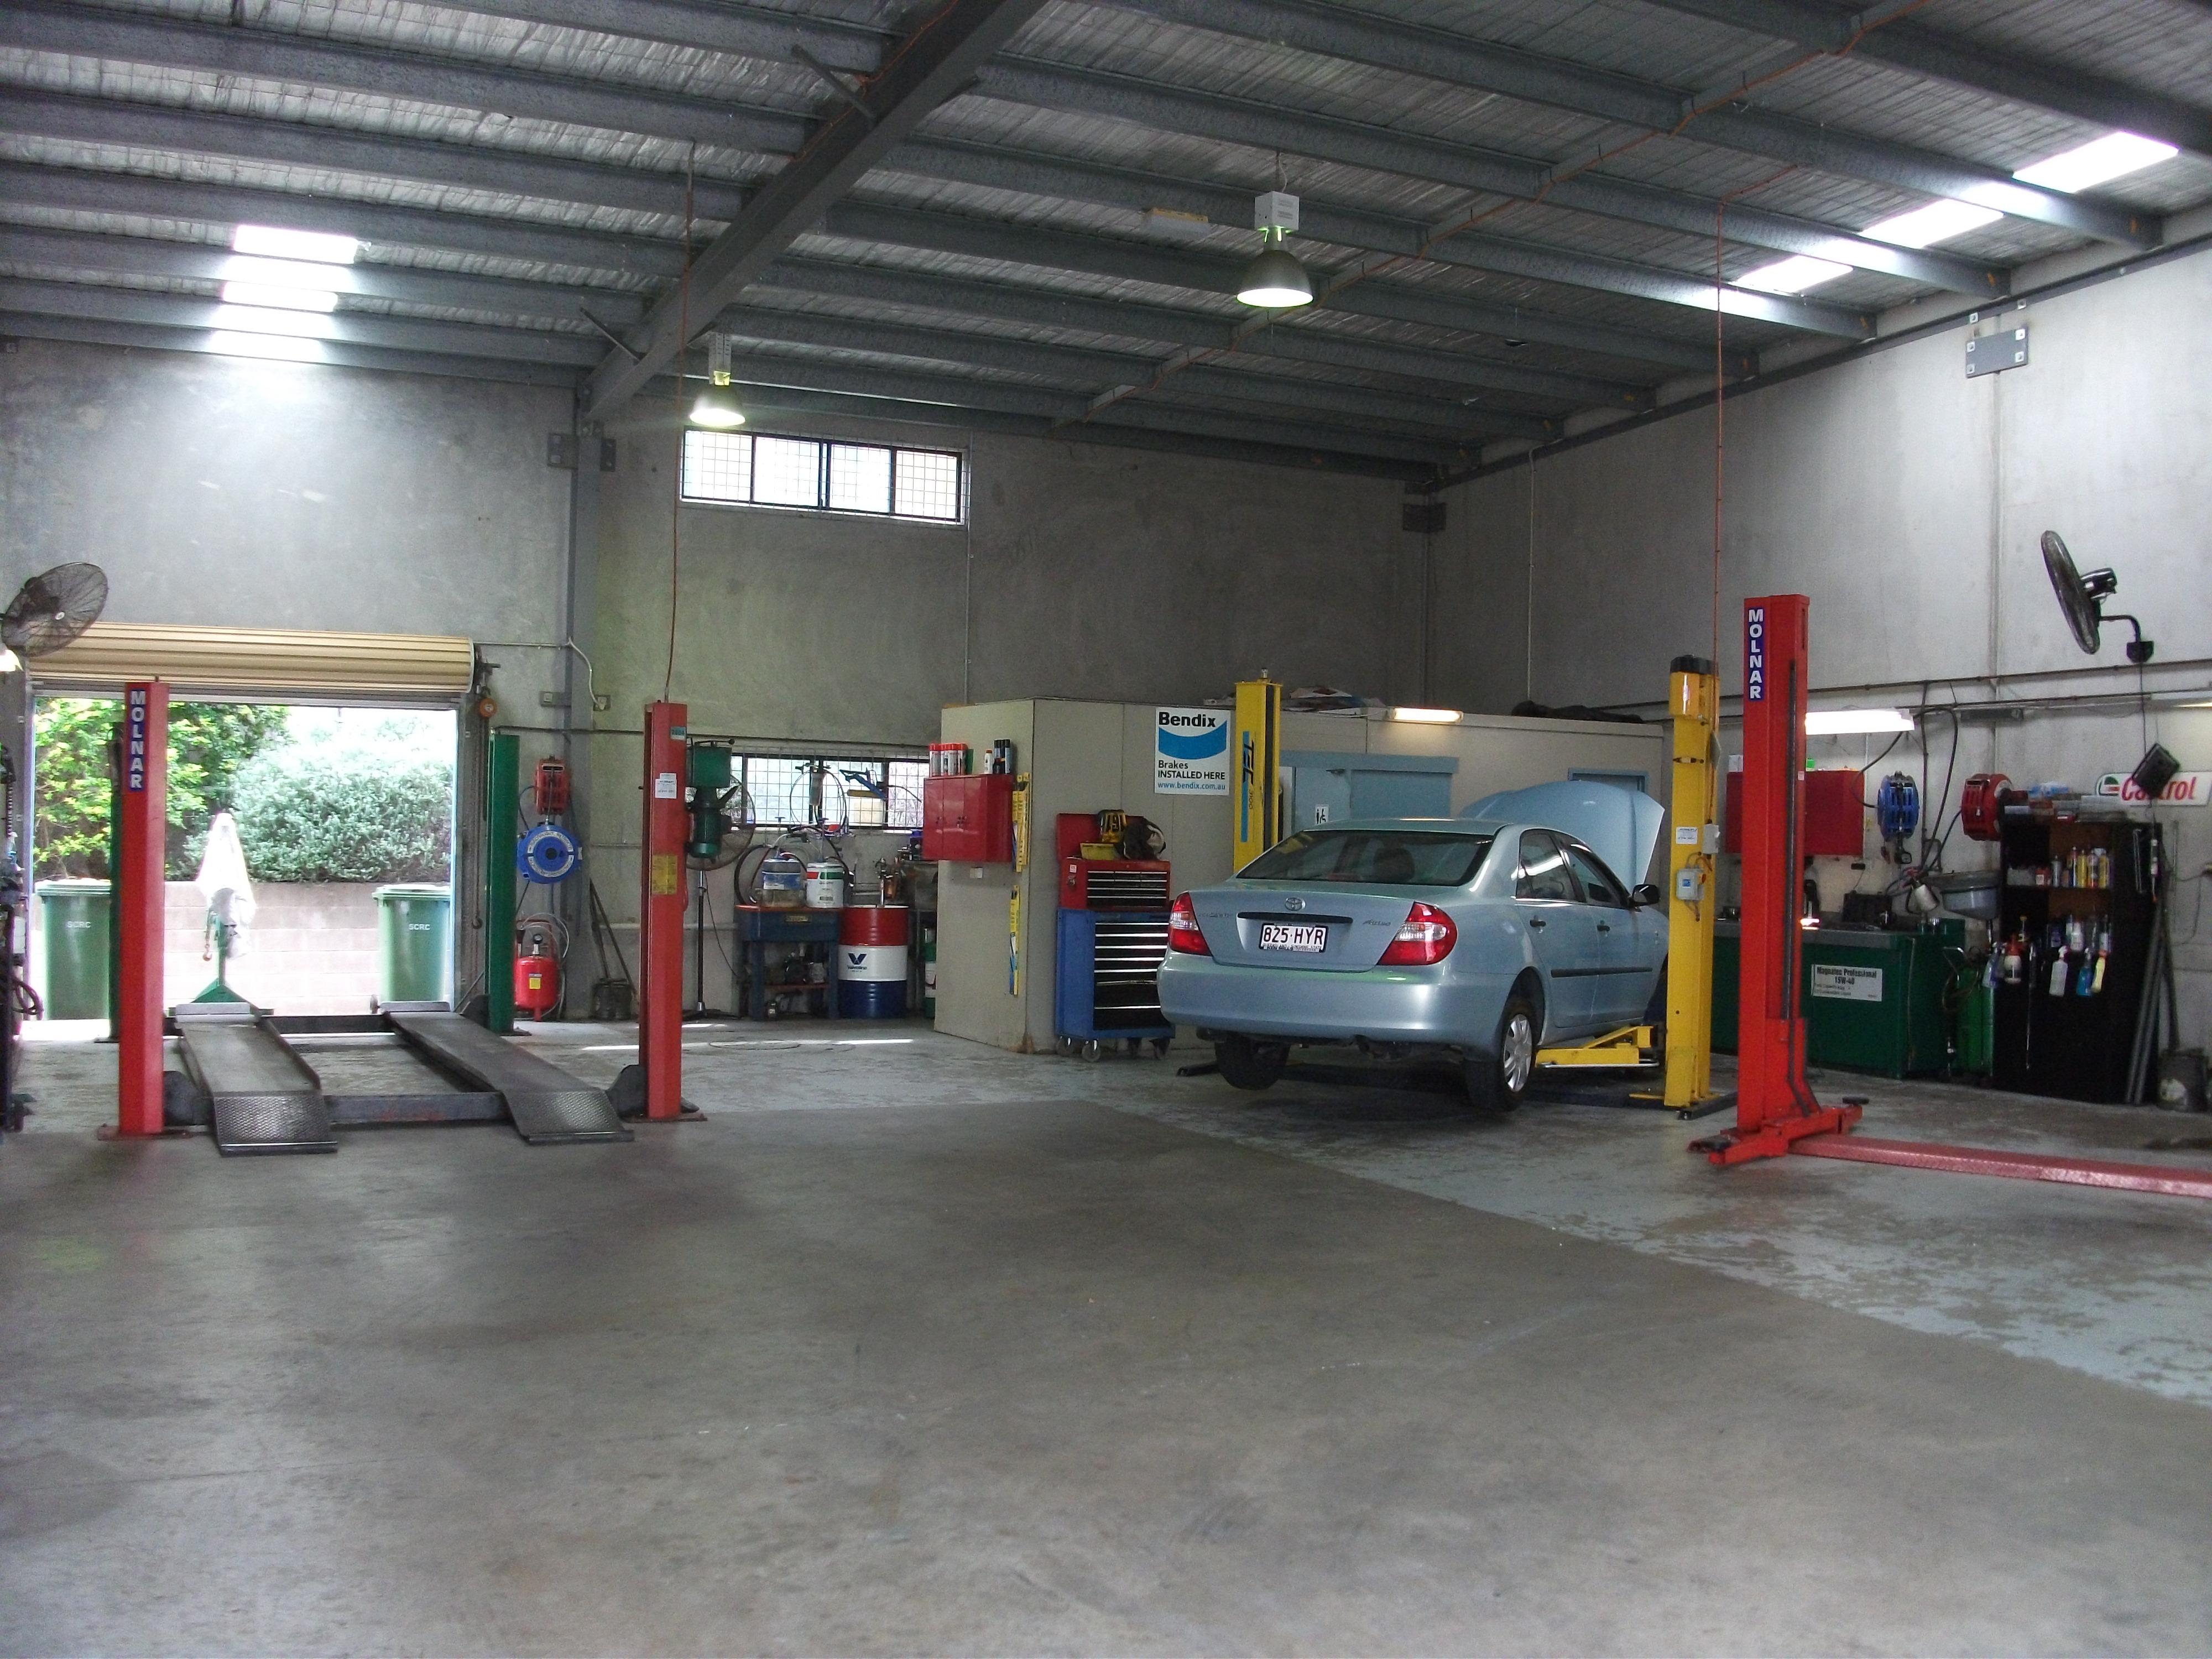 Sunshine Coast Car Servicing & Air Conditioning Business - Maroochydore.